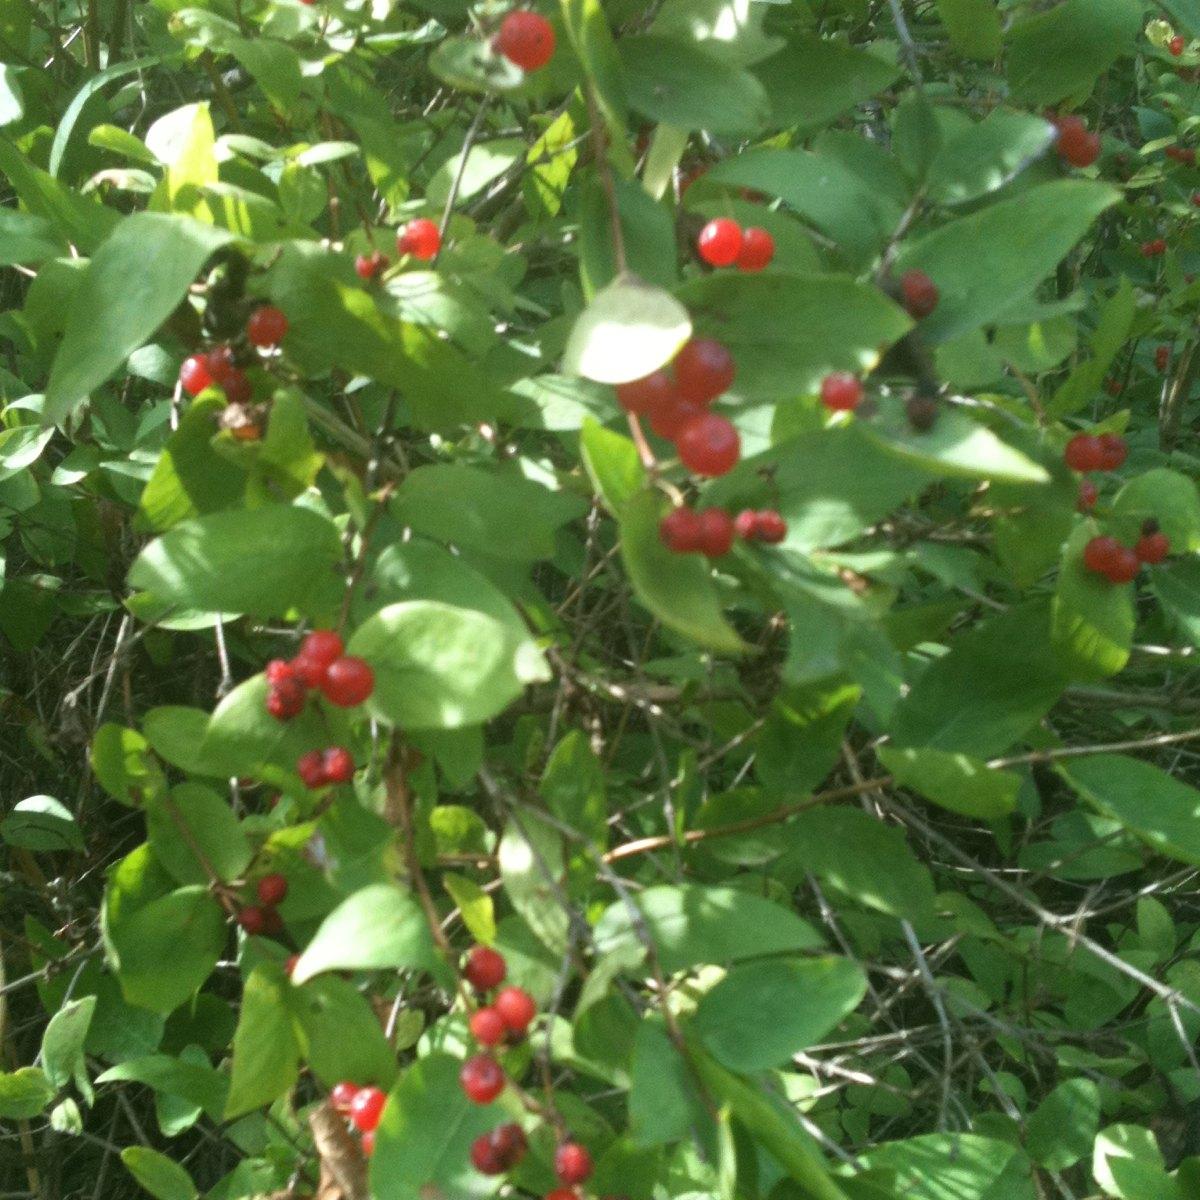 Red wild berry